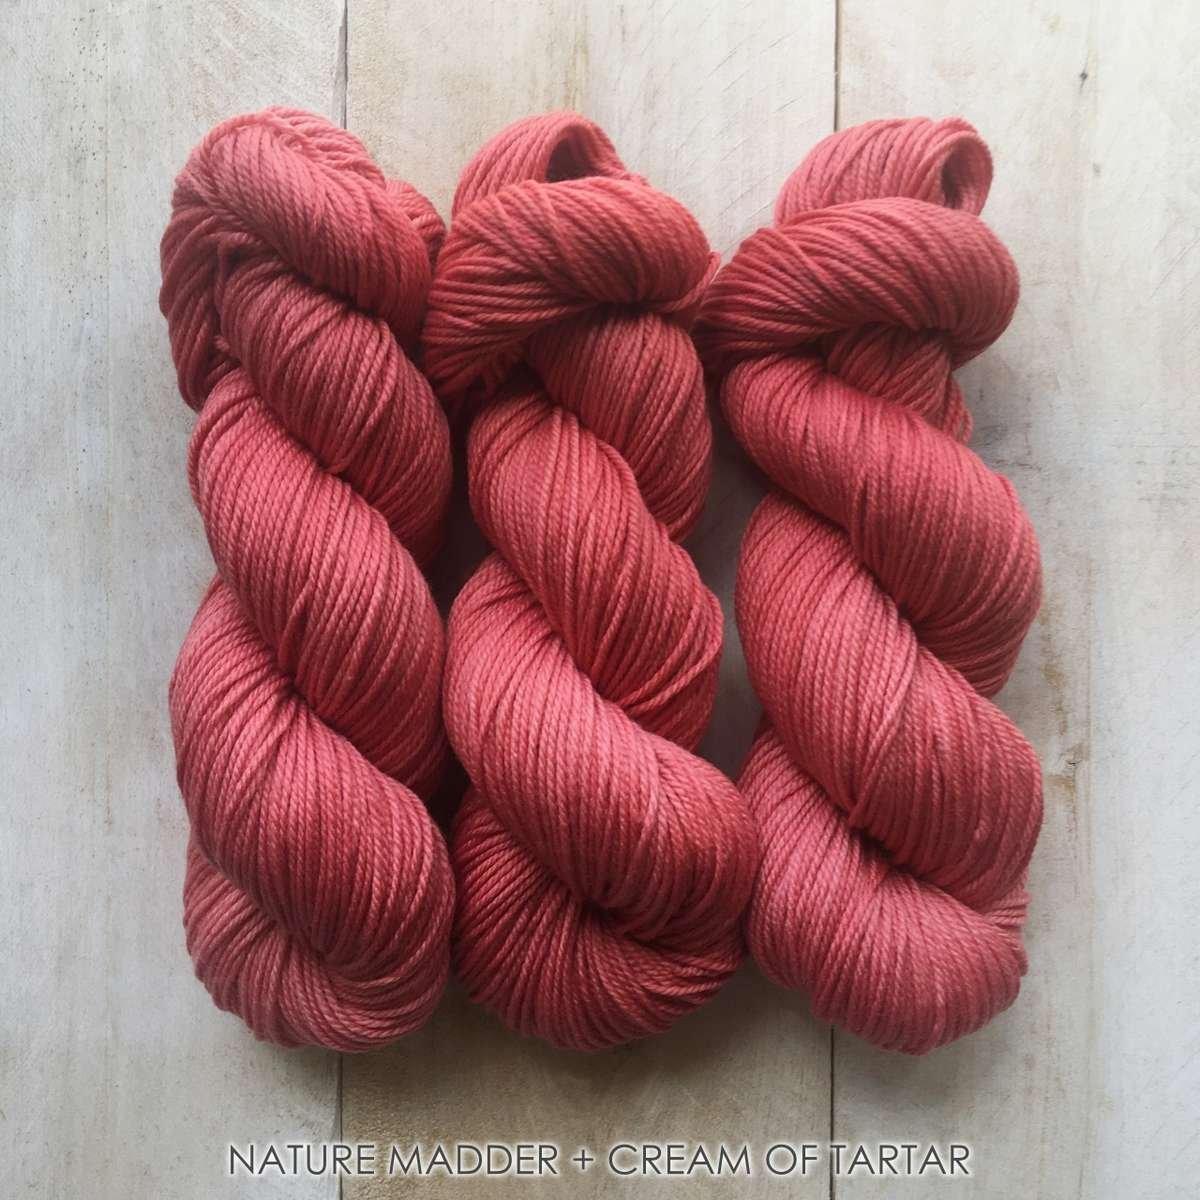 Hand-dyed yarn Louise Robert NATURE Madder + cream of tartar